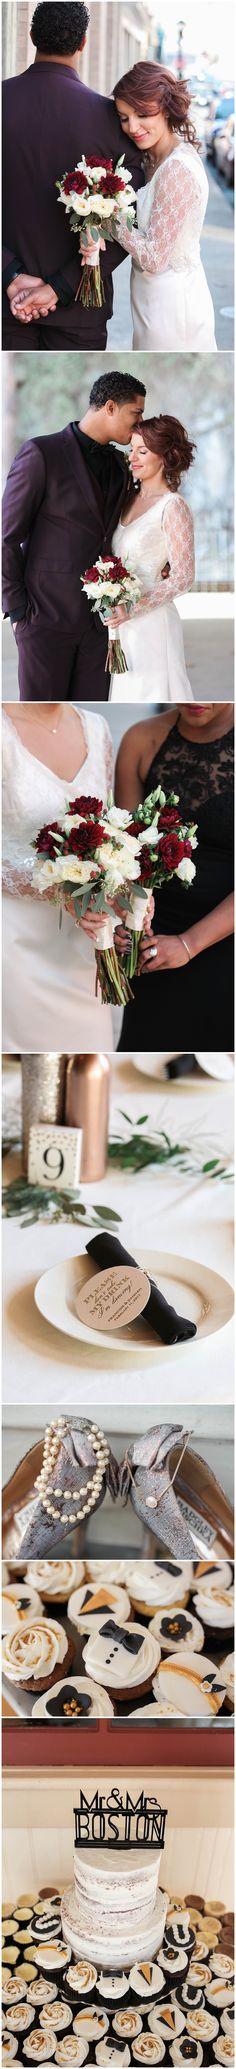 Dannah + Francois - Staunton - American Hotel and Banquet Hall Wedding